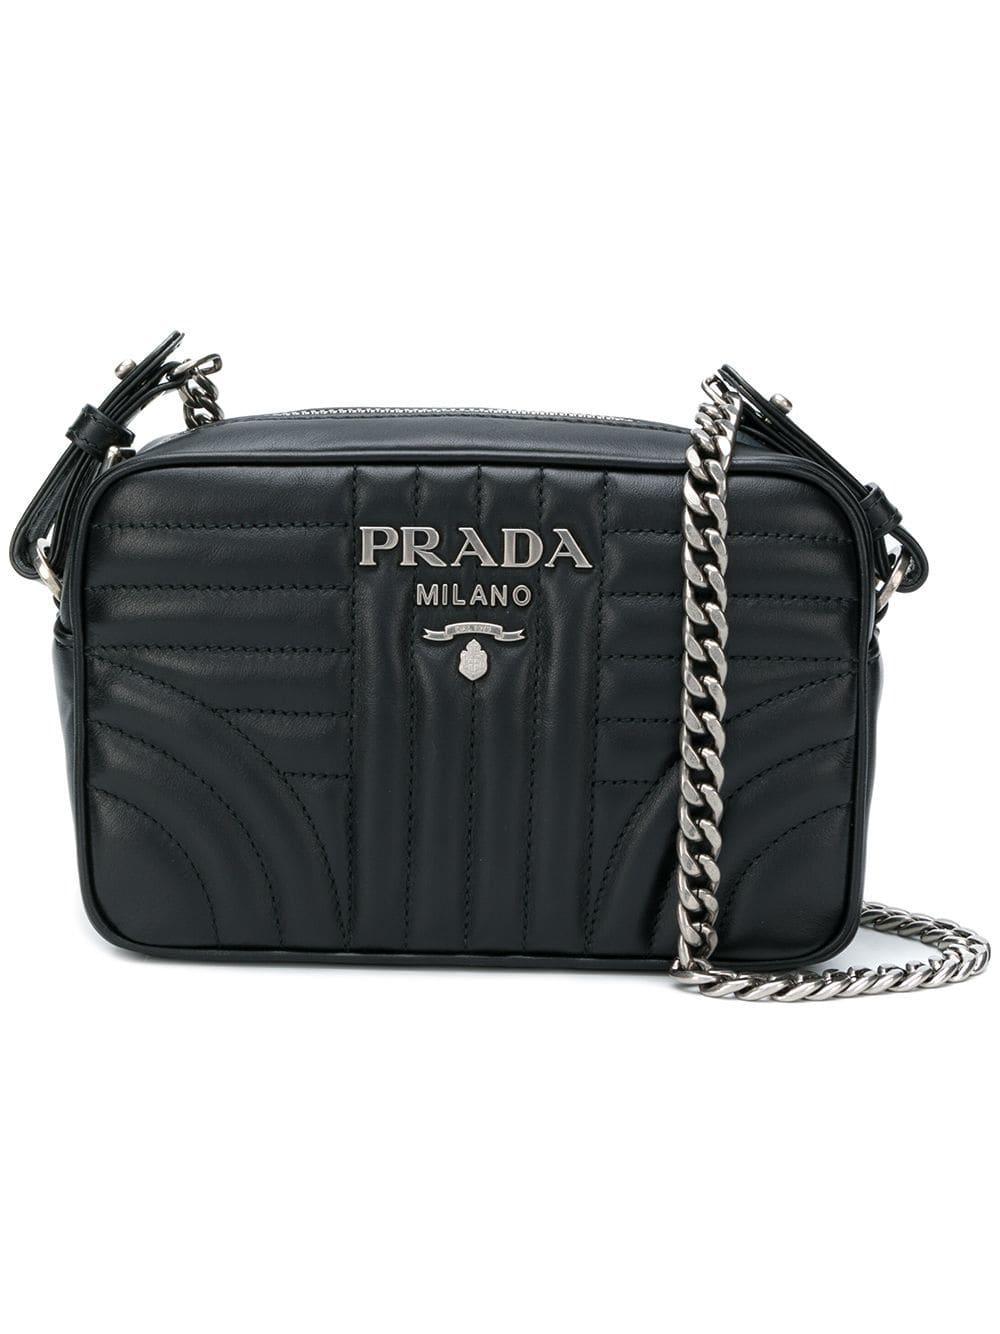 6fed688cfd7a Prada - Black Diagramme Camera Bag - Lyst. View fullscreen